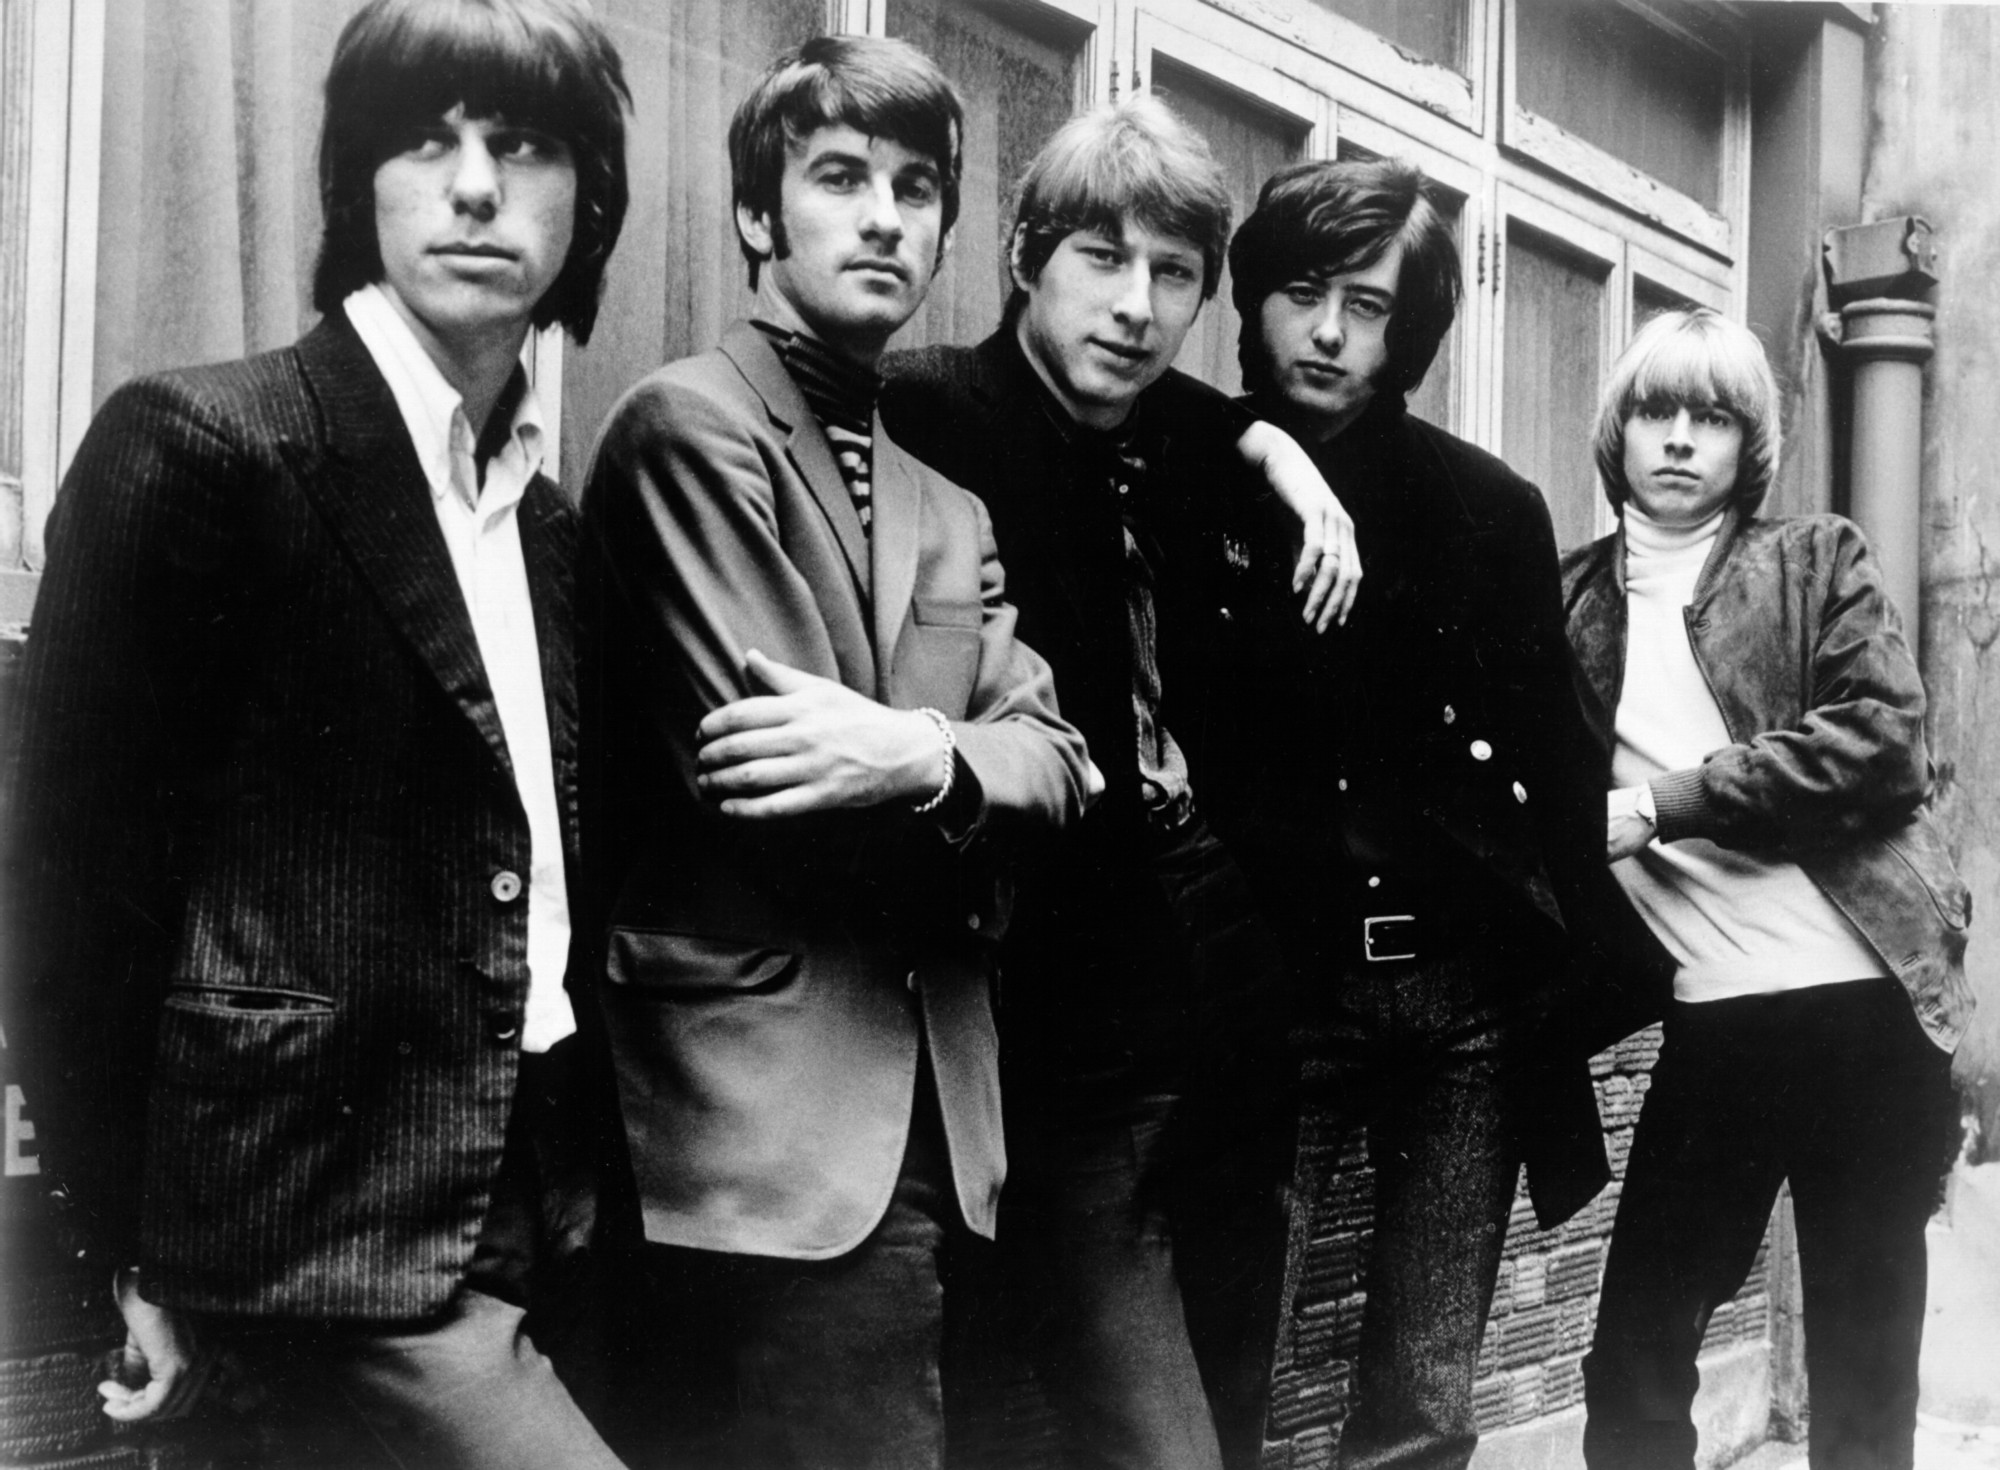 Yardbirds, The Image